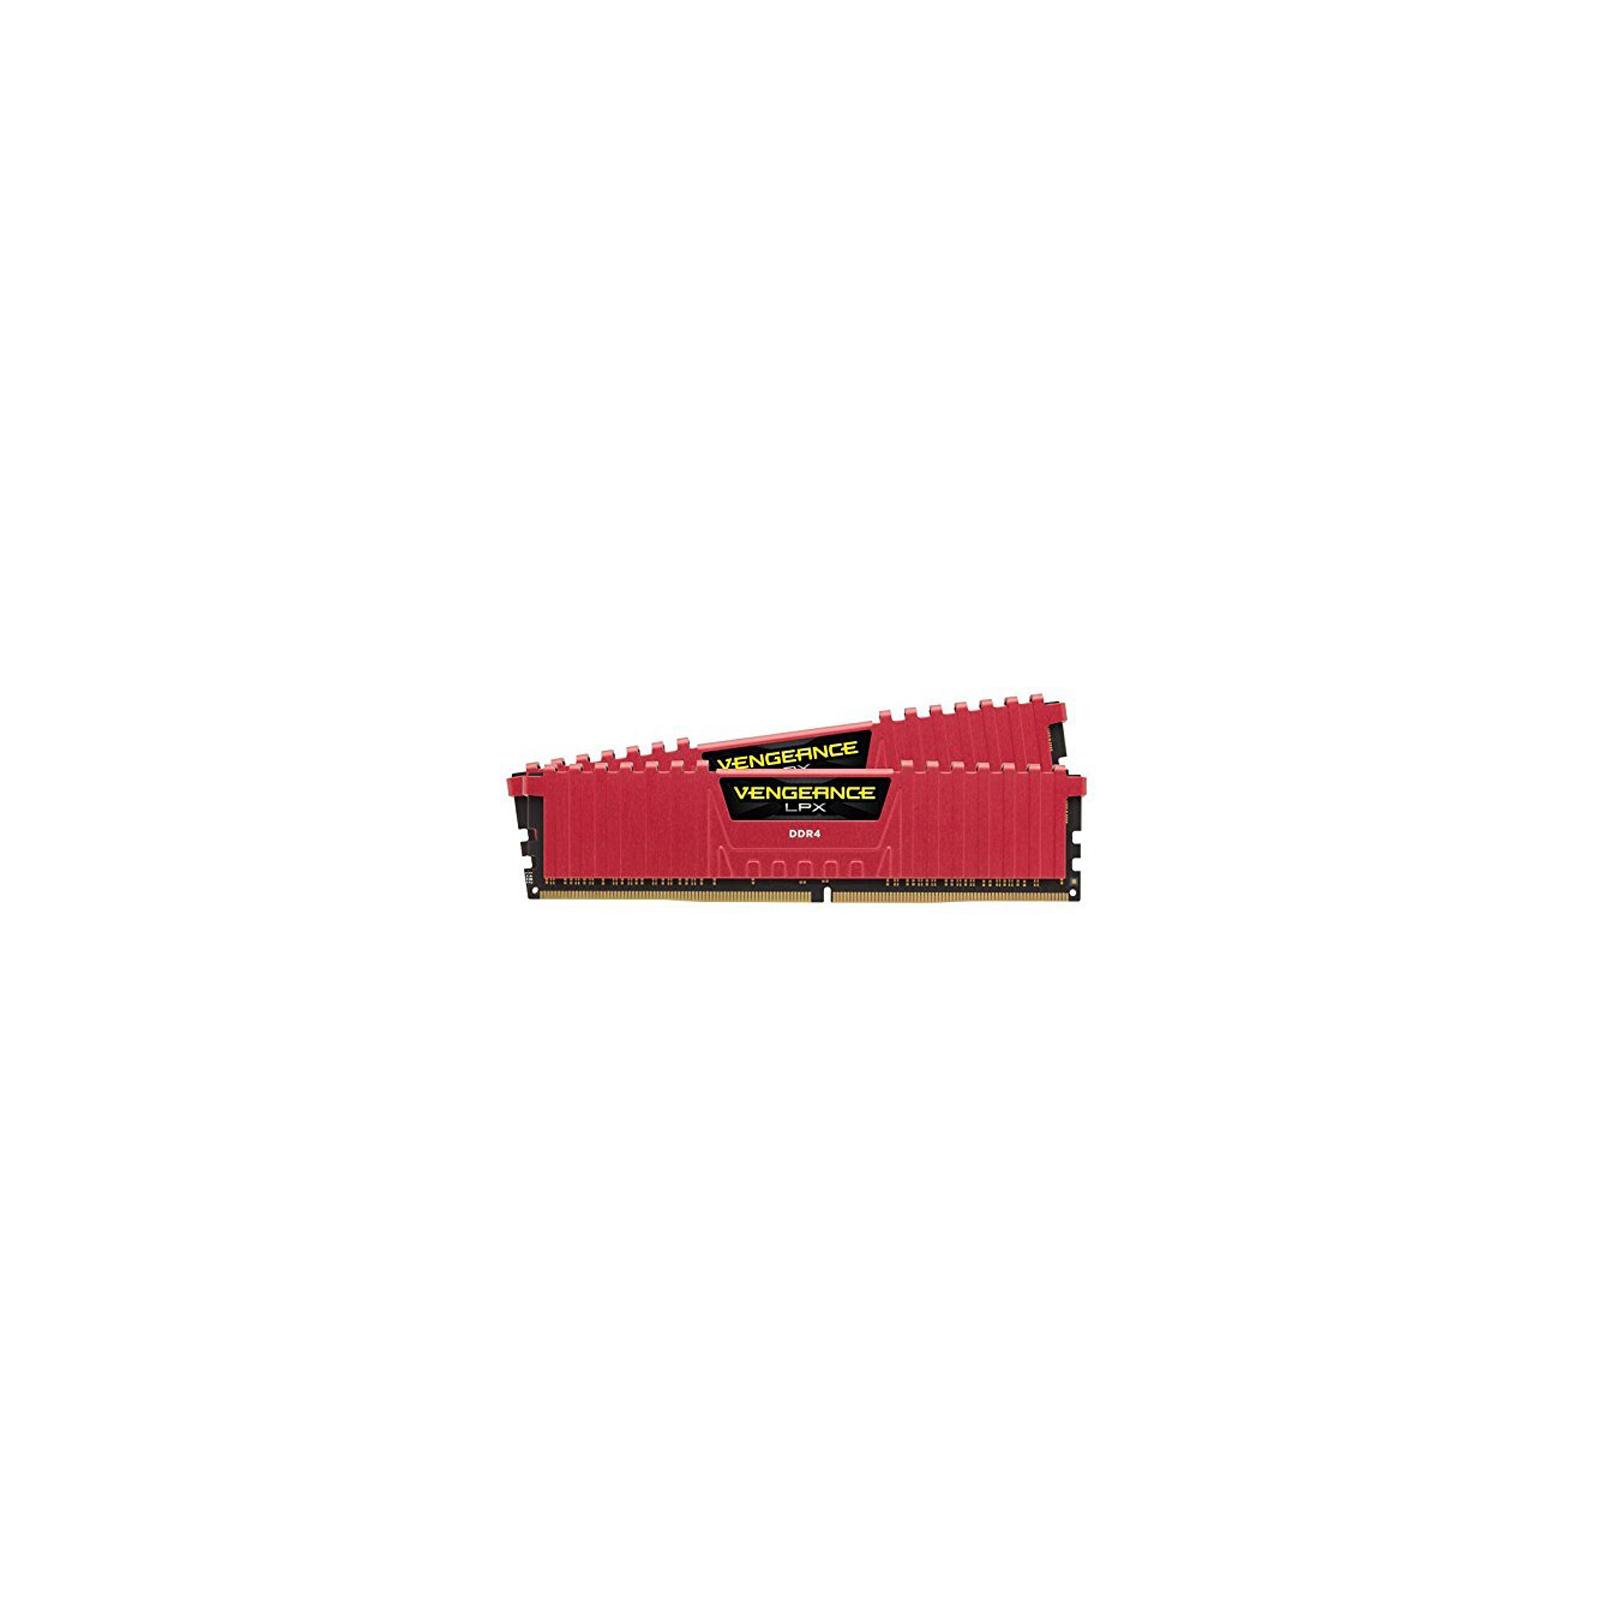 Модуль памяти для компьютера DDR4 16GB (2x8GB) 2666 MHz Vengeance LPX Red CORSAIR (CMK16GX4M2A2666C16R) изображение 2